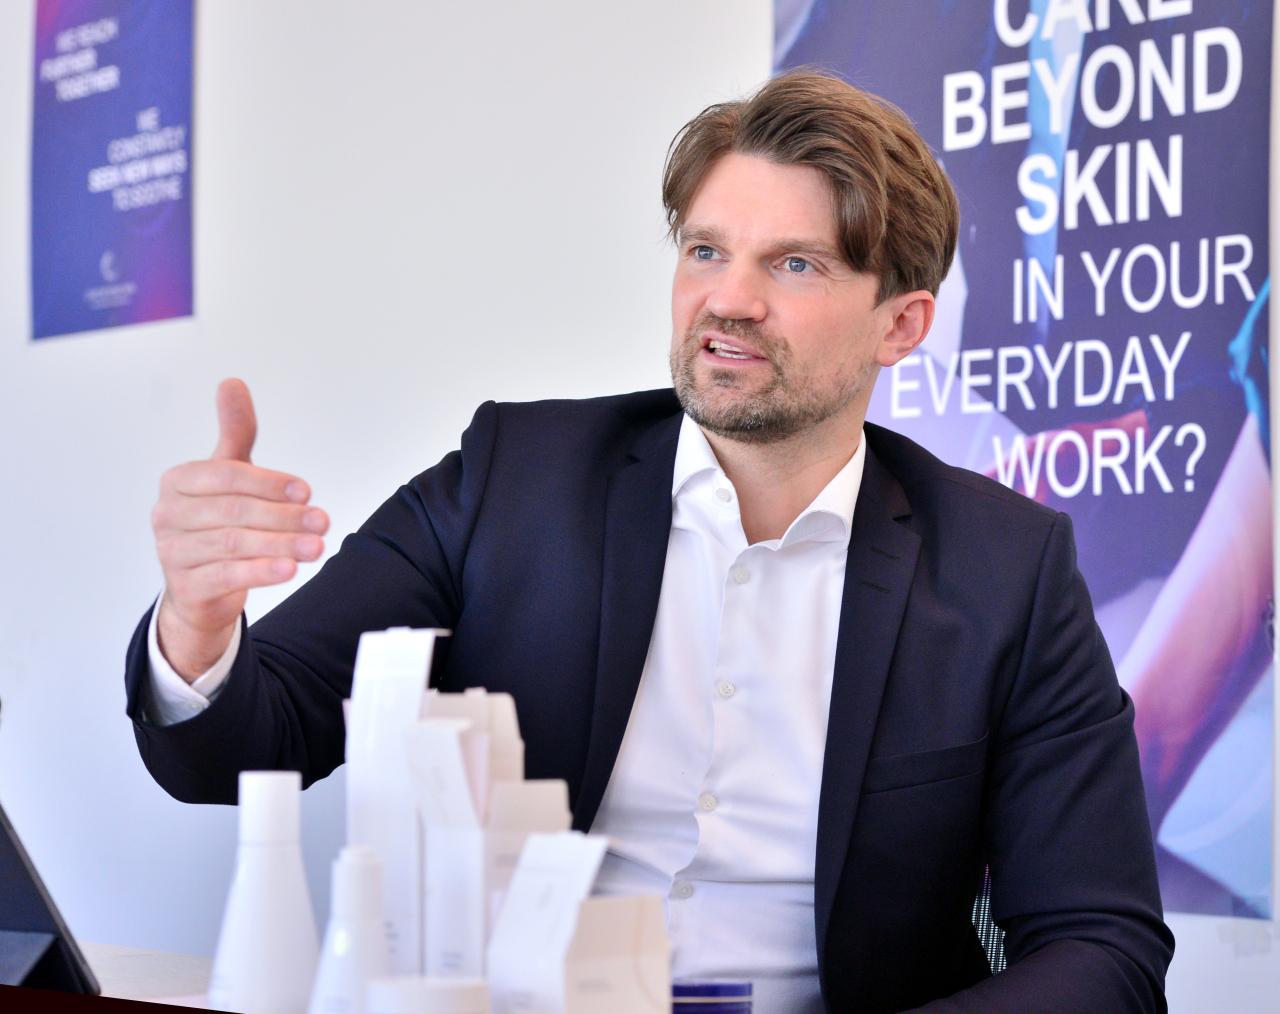 Endrik Hasemann, general manager of Beiersdorf Korea (Park Hyun-koo/The Korea Herald)